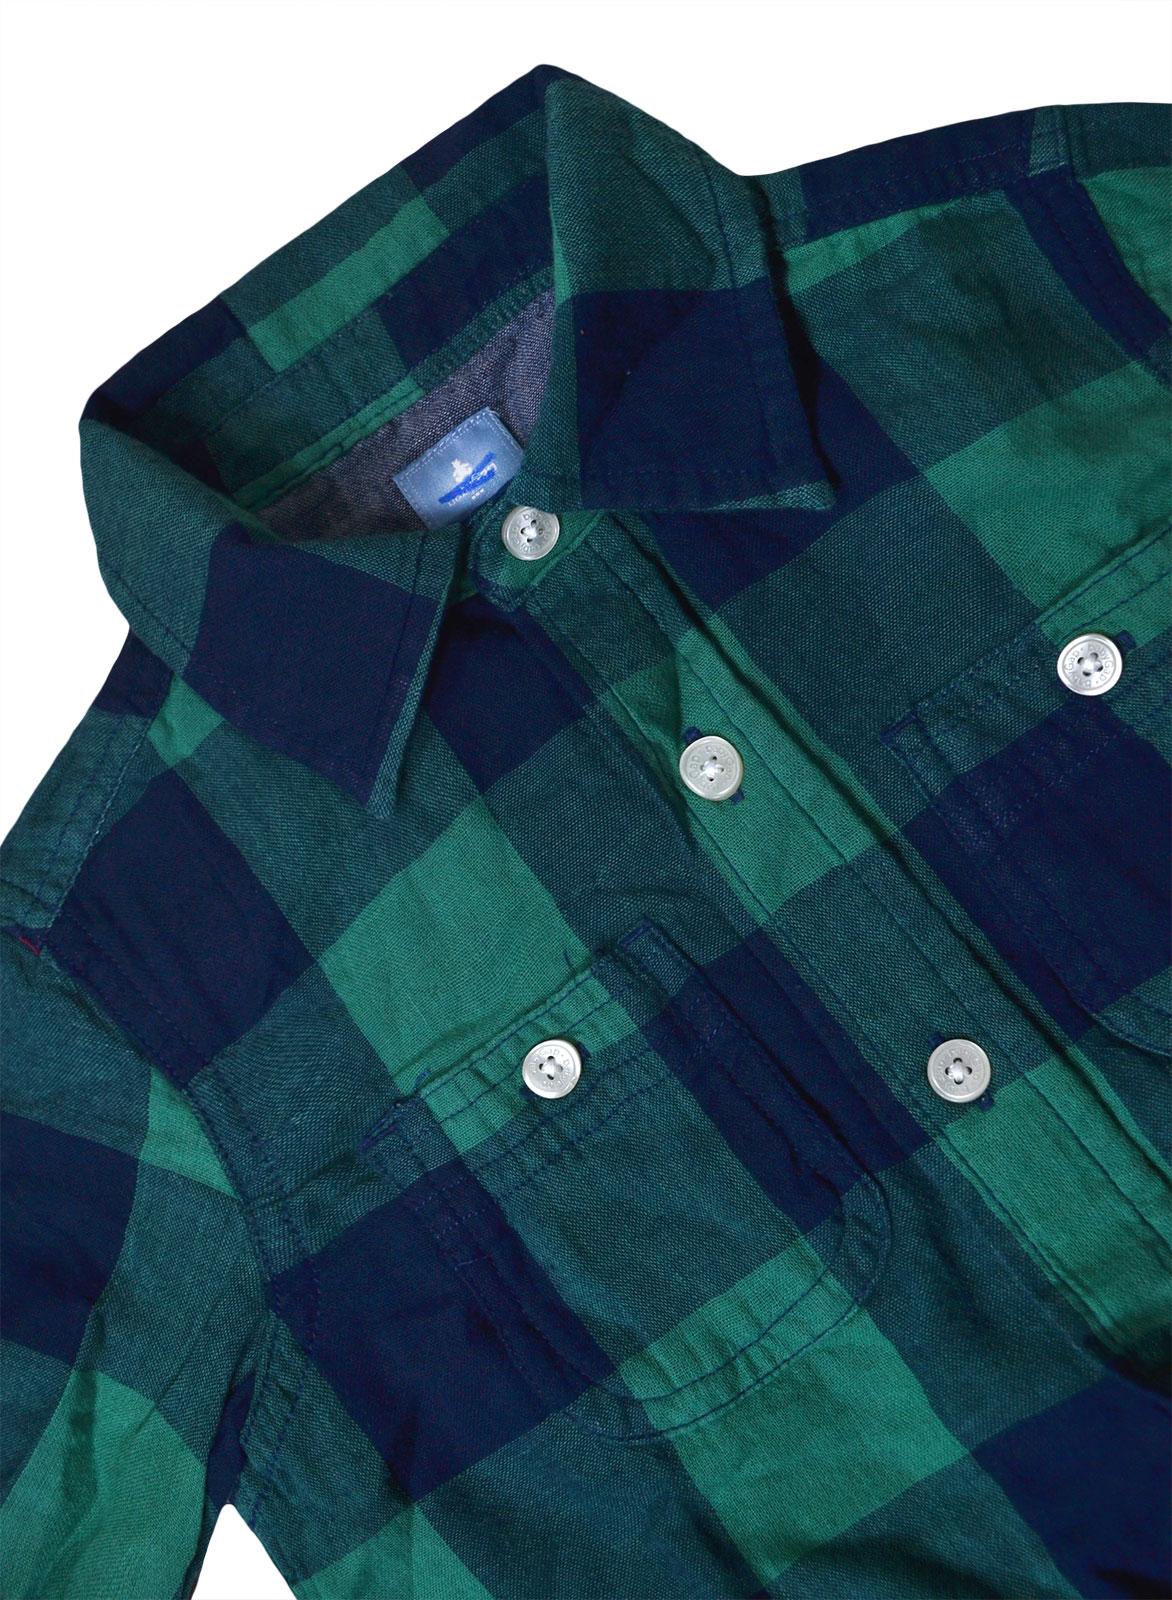 Boys-Ex-GAP-Shirt-Boy-Long-Sleeve-Cotton-Top-Green-Check-Ages-2-3-4-5-6-Years miniatura 4